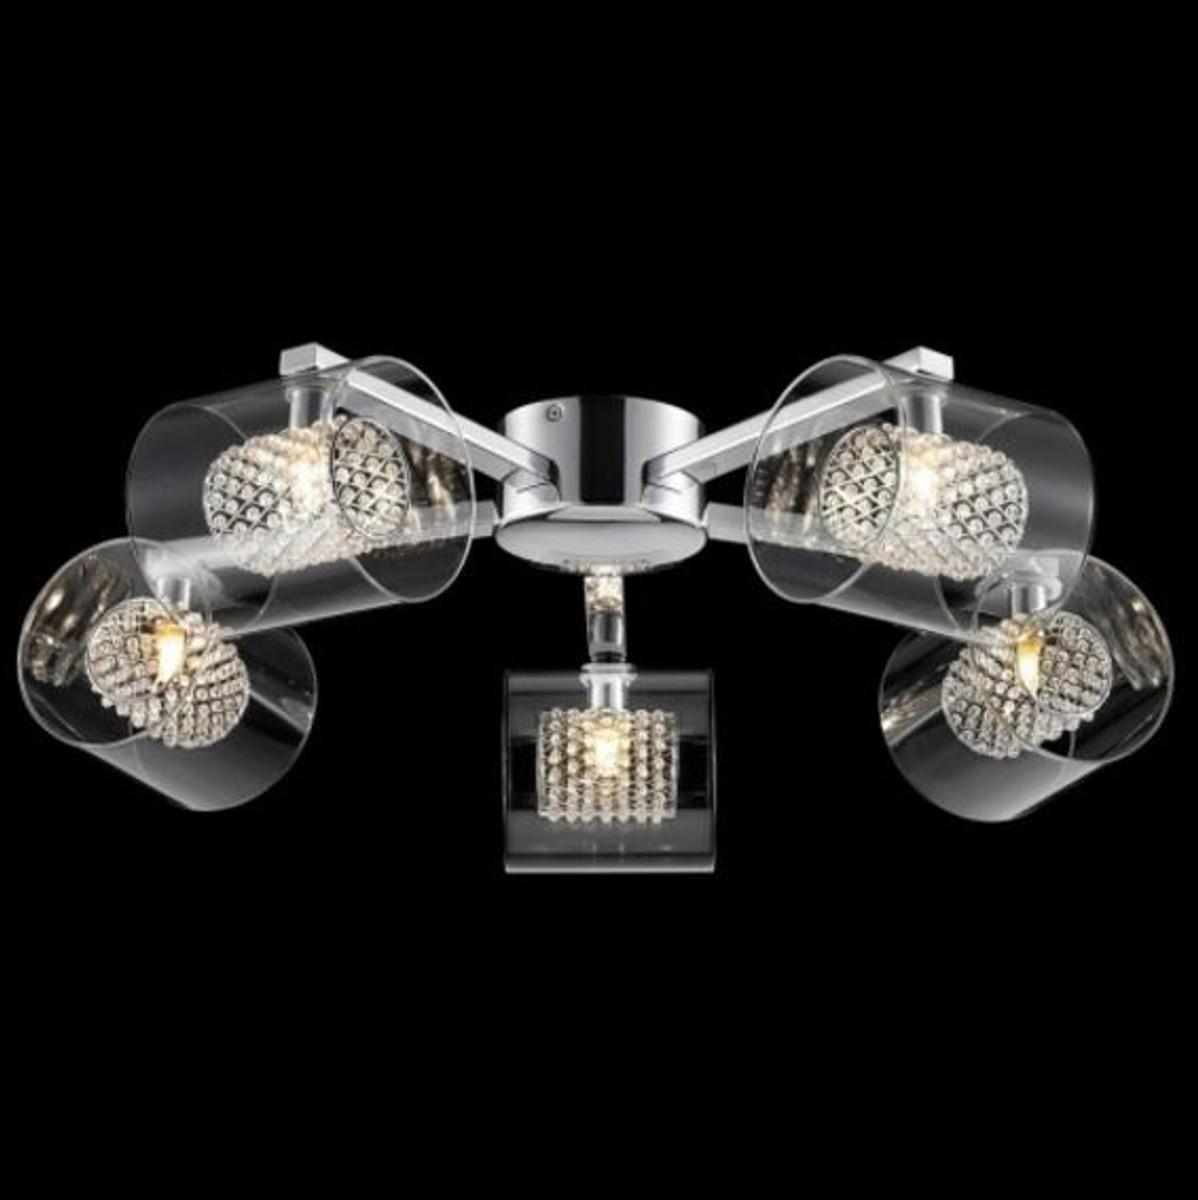 Casa Padrino Barock Decken Kronleuchter Chrom 61 X H 17 Cm Modern Stil    Möbel Lüster